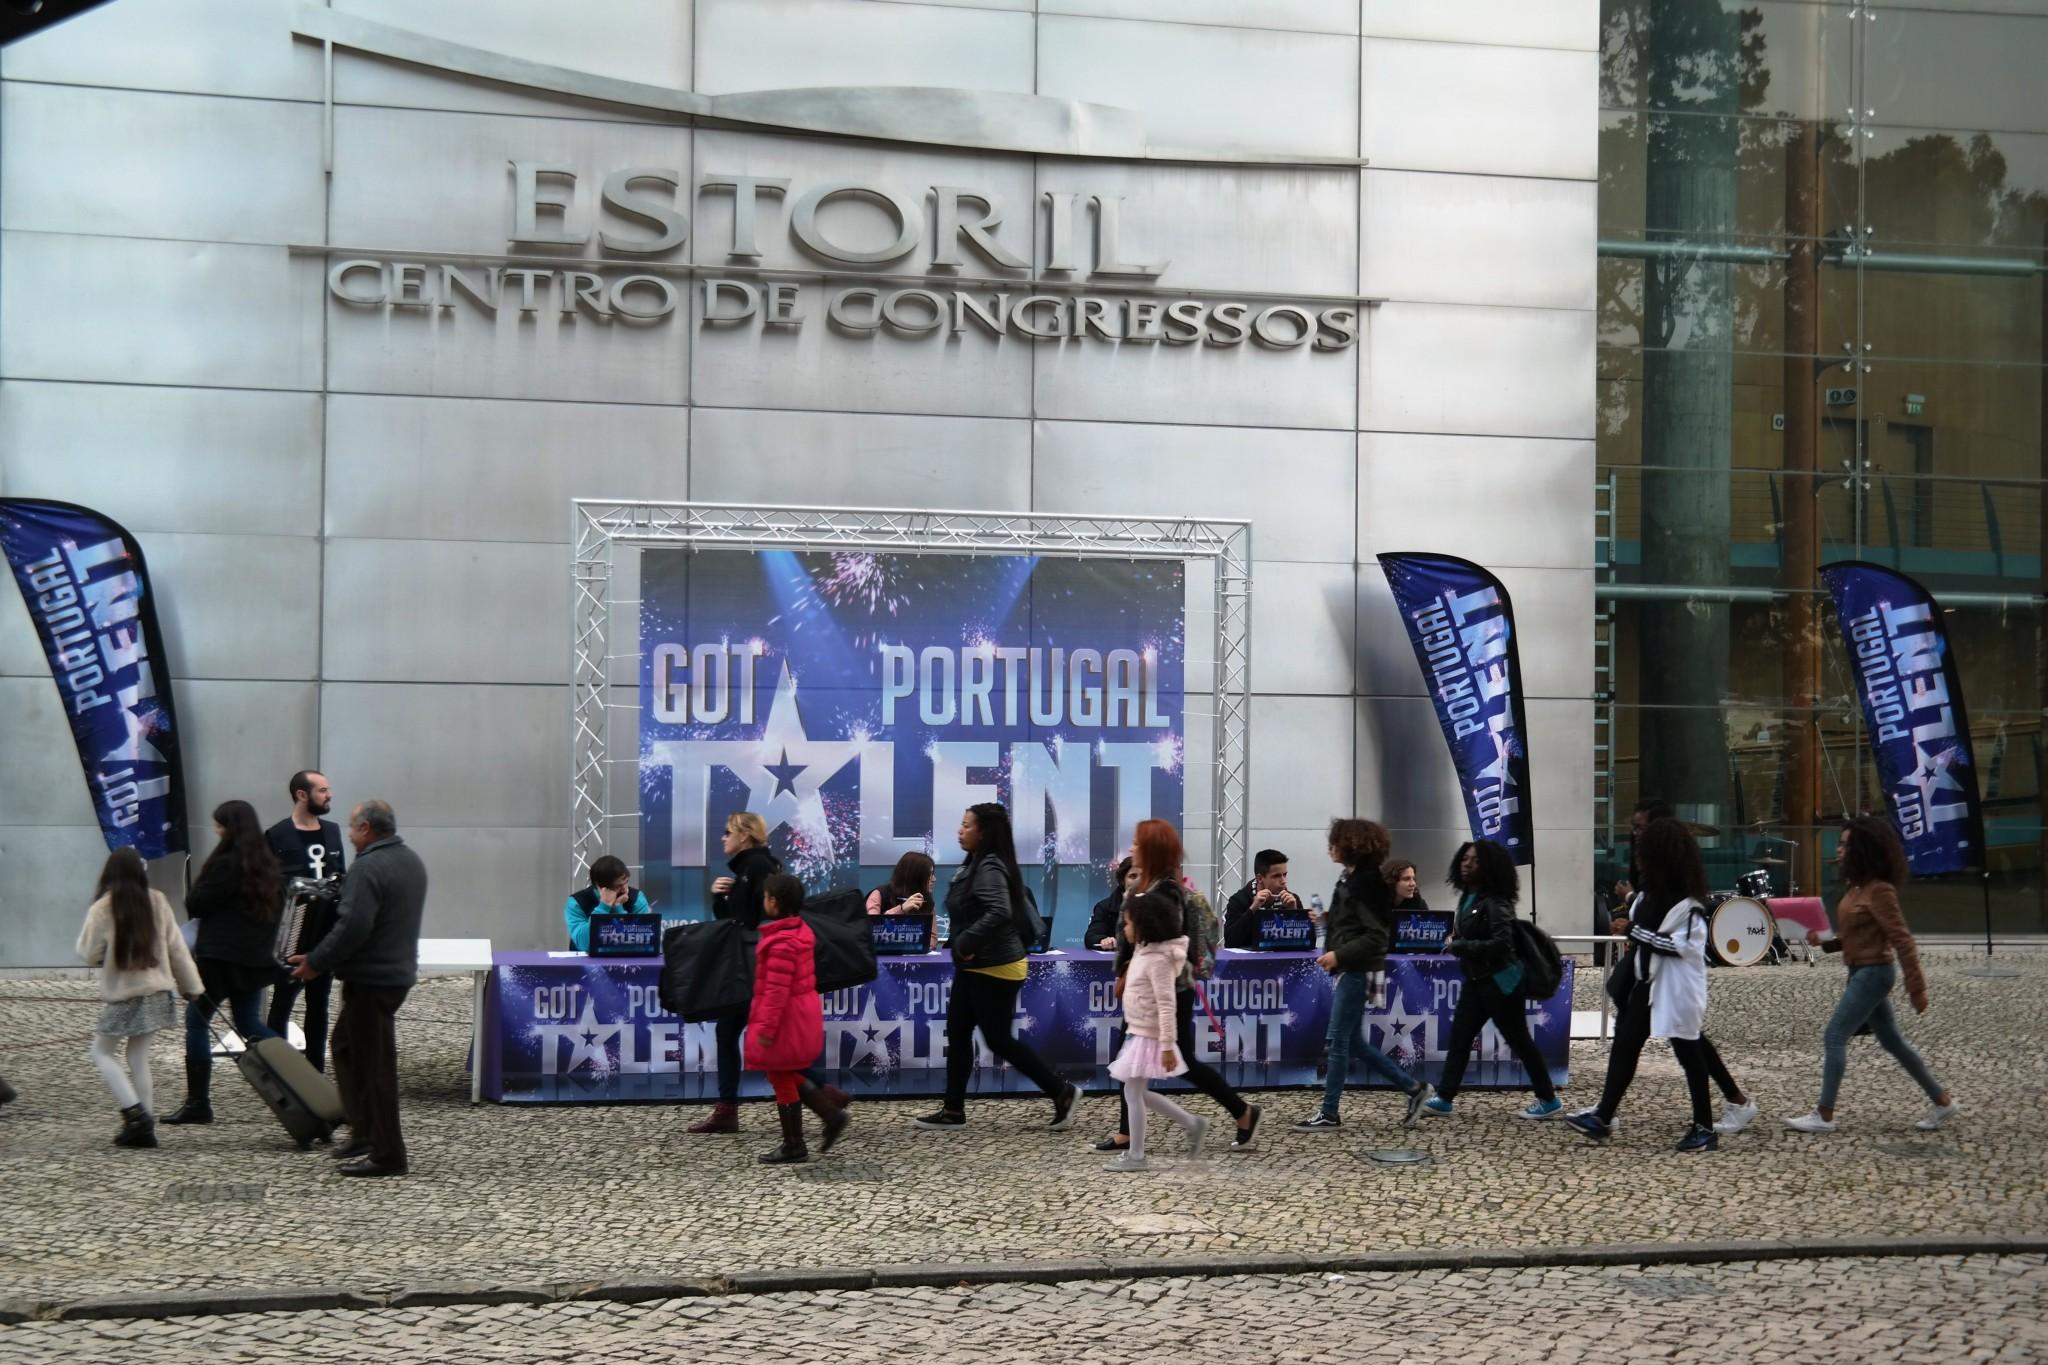 Got Talent Portugal 02 Estoril 015 «Got Talent Portugal»: Estoril Acolhe Mais De 3 Mil Candidatos [Com Fotos]